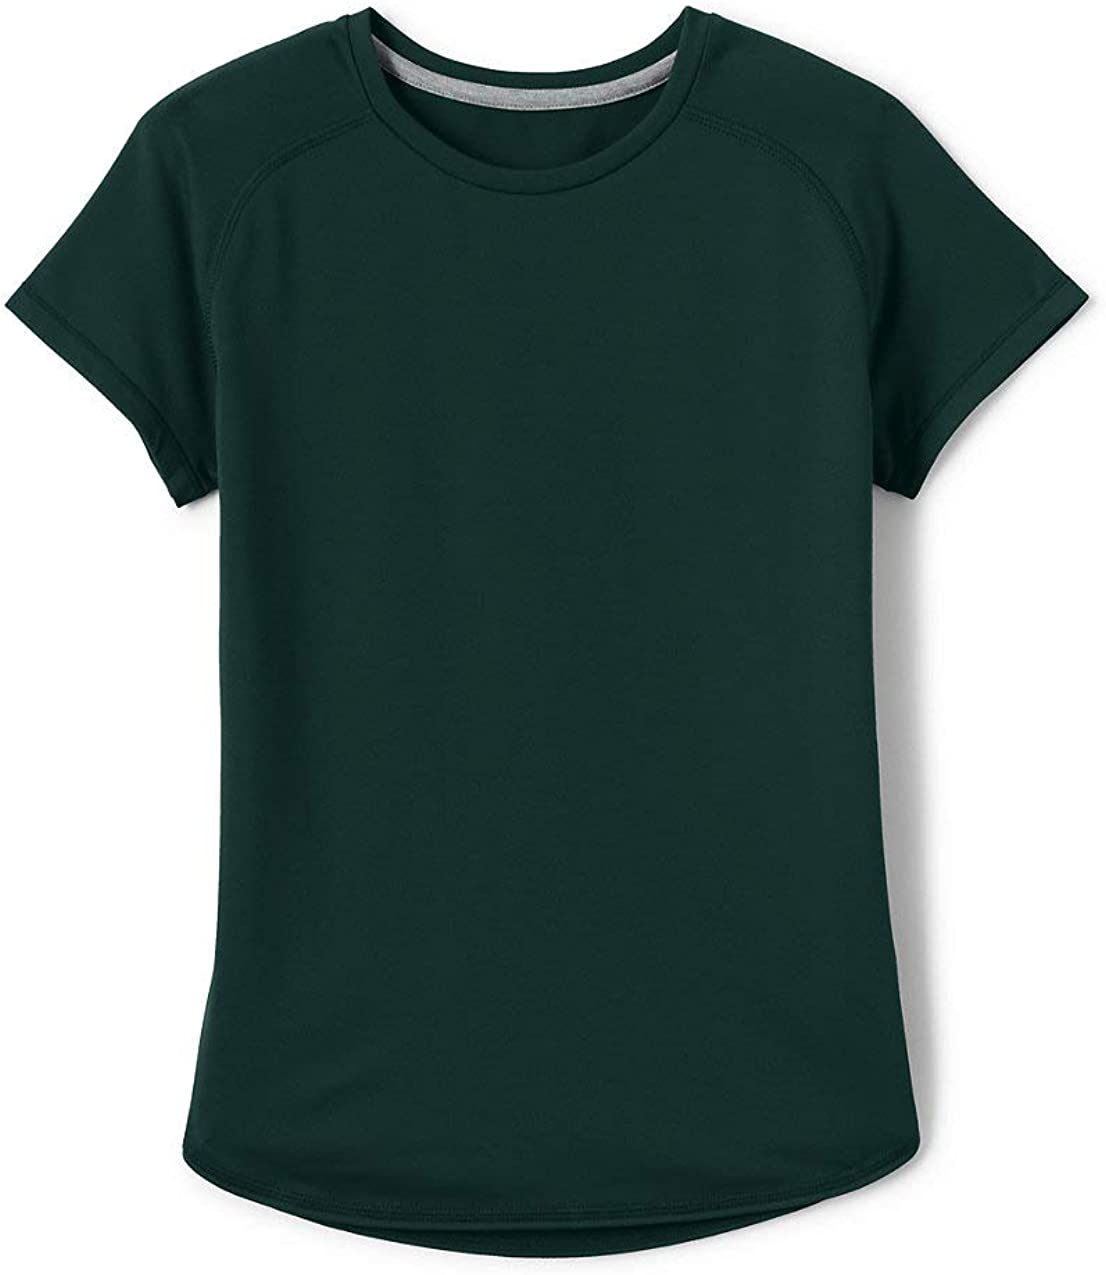 Lands' End School Uniform Girls Short Sleeve Active Gym T-Shirt